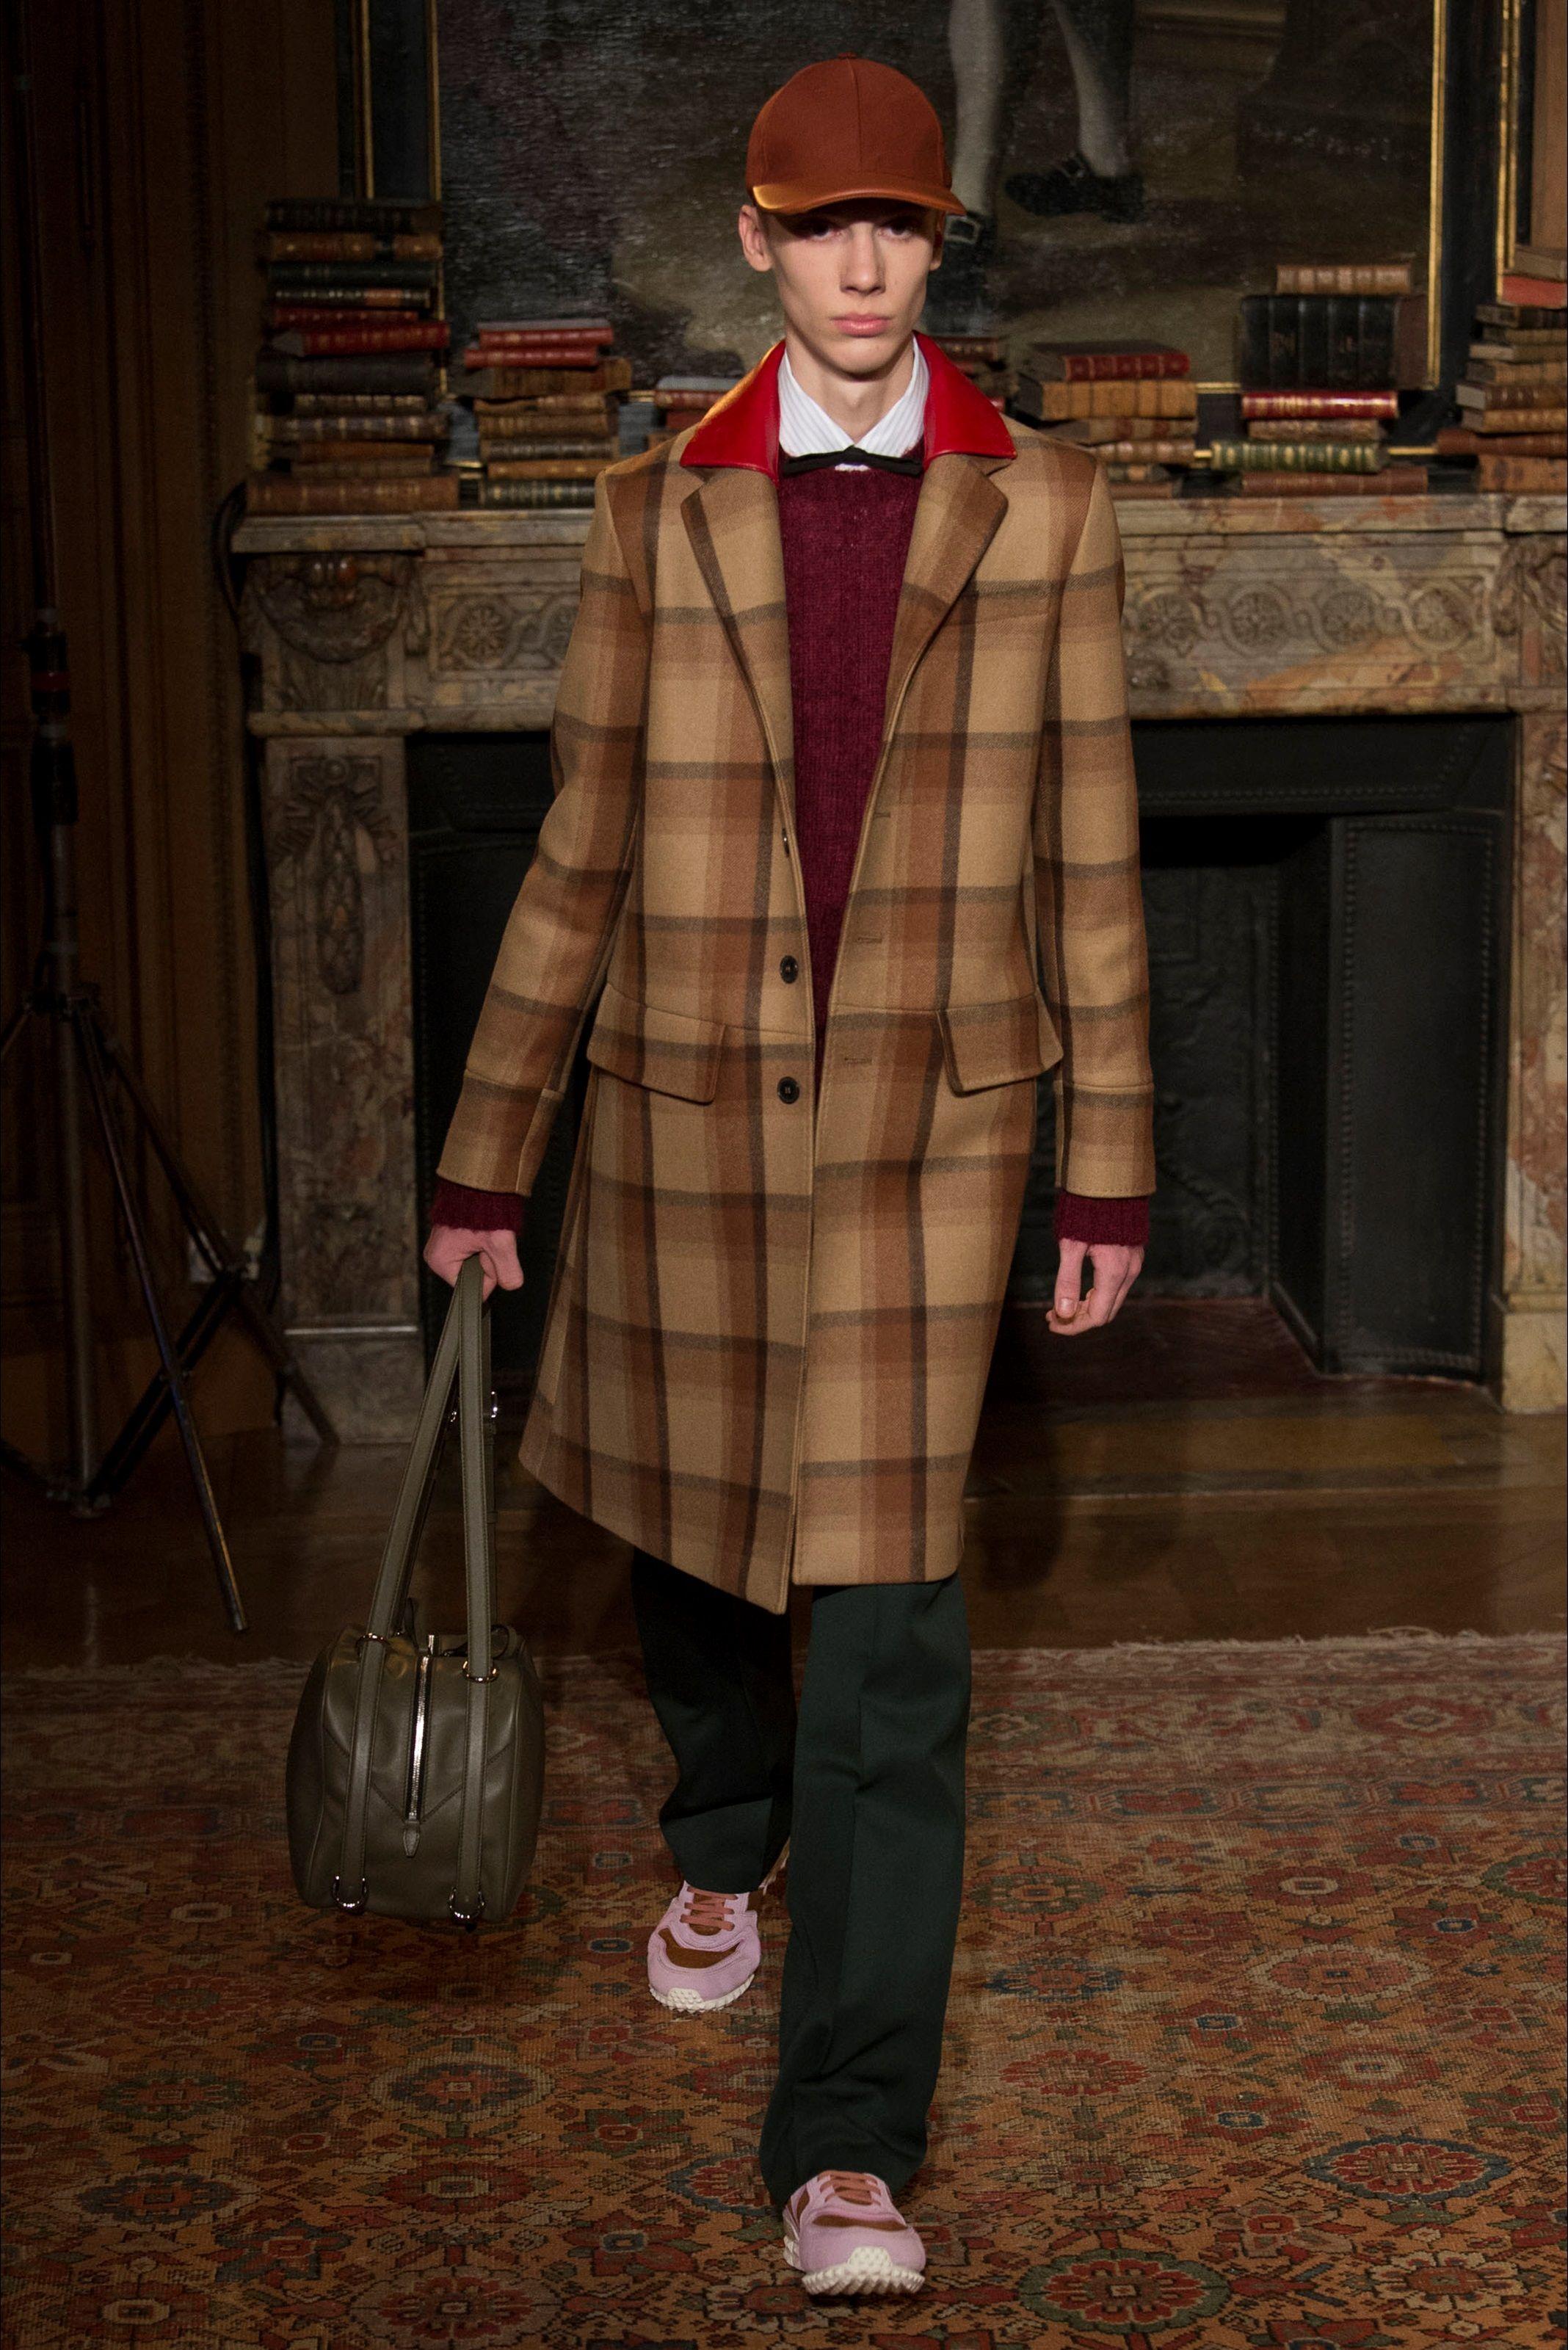 Sfilata Moda Uomo Valentino Parigi - Autunno Inverno 2017-18 - Vogue ... dce8f501260